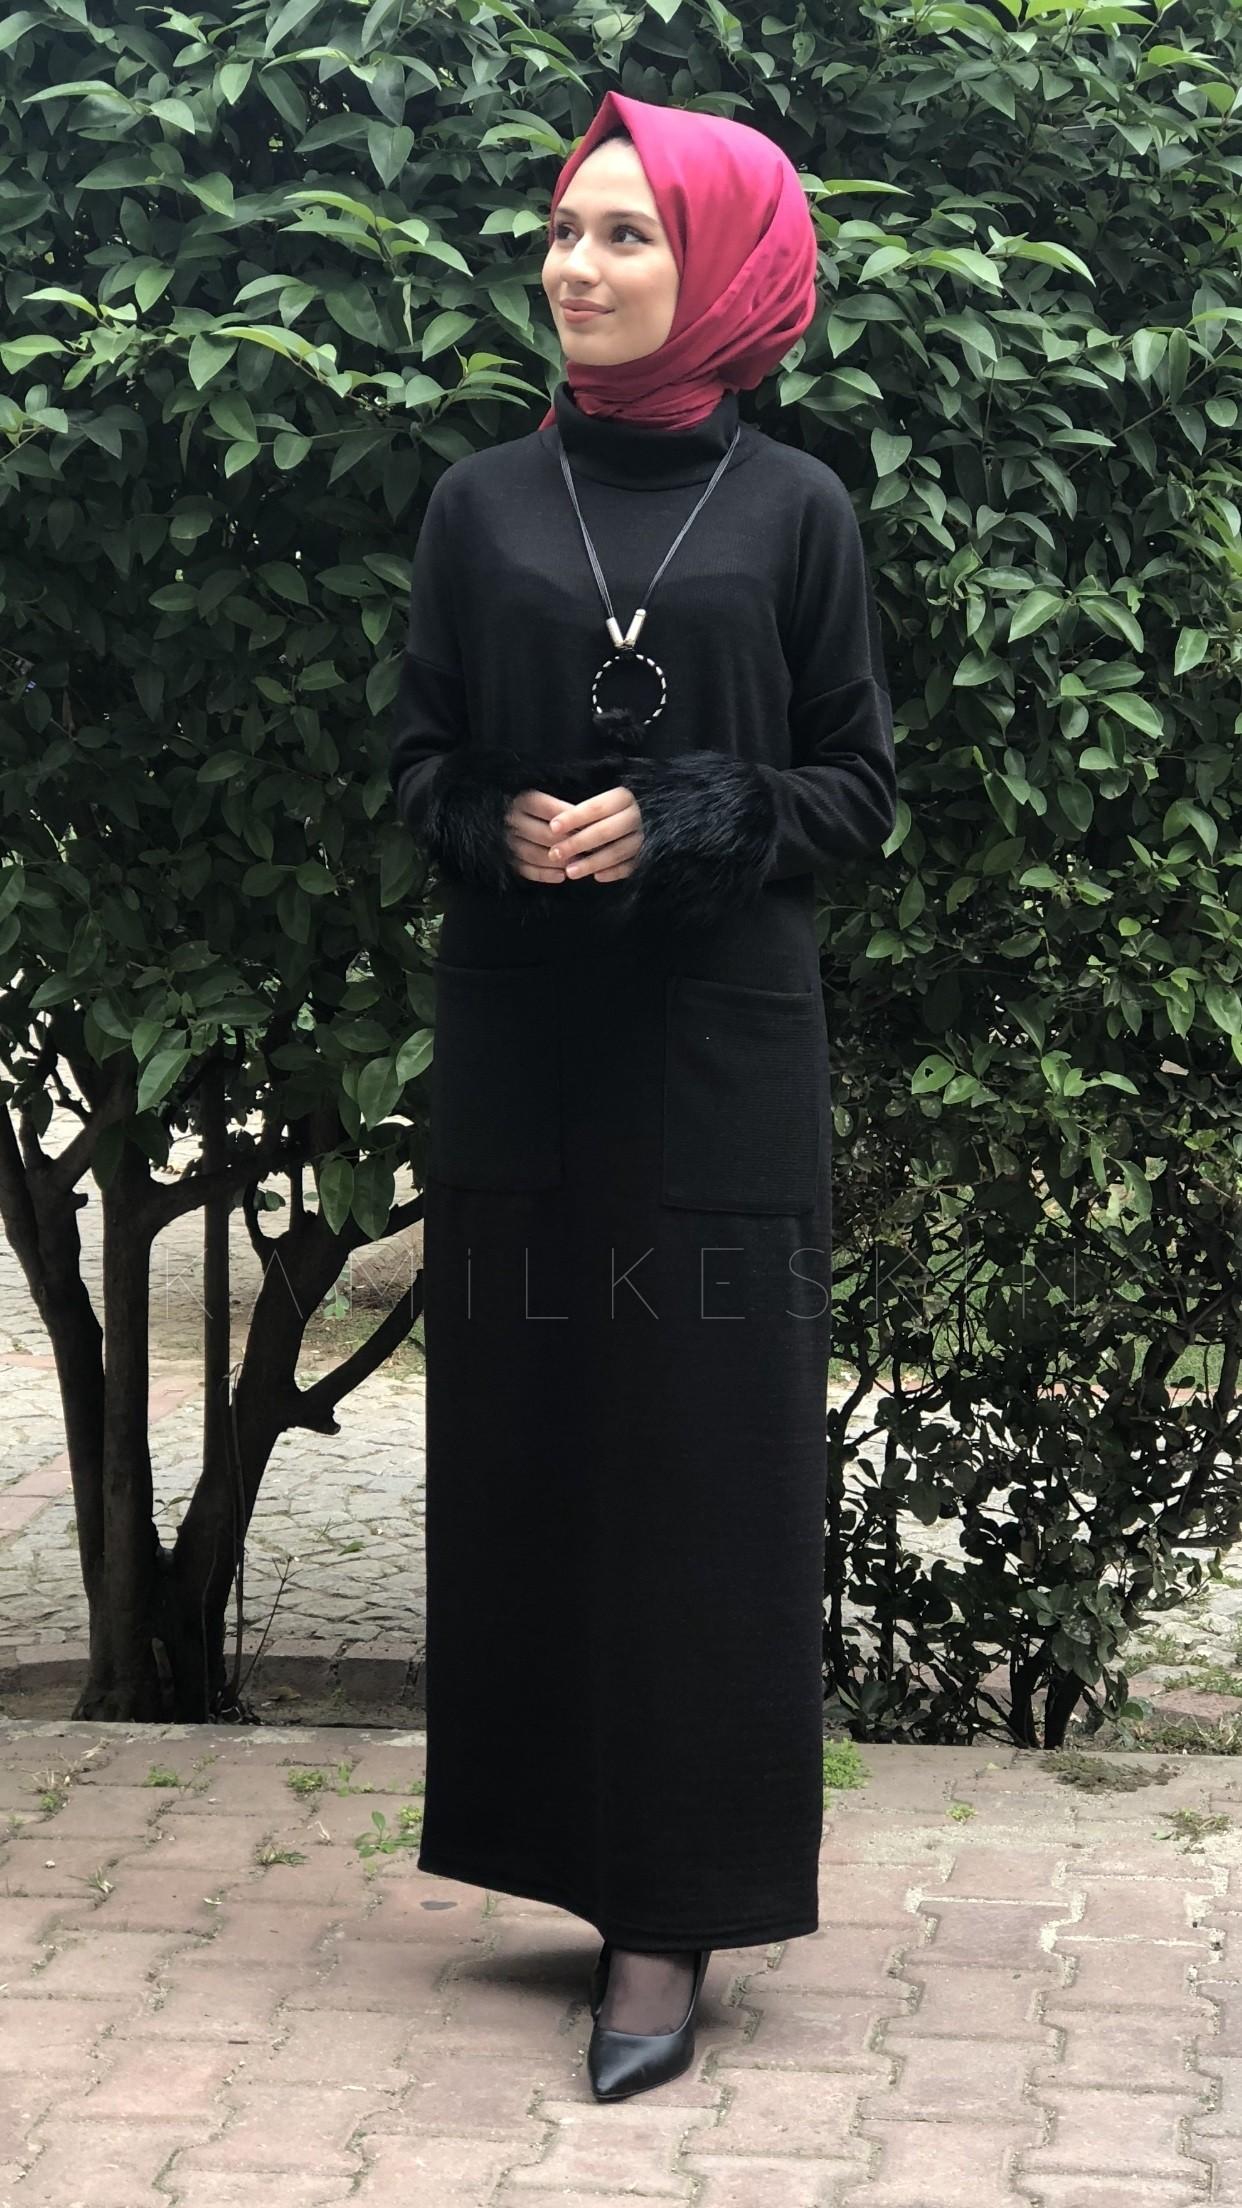 ELBİSE KOL KÜRKLÜ